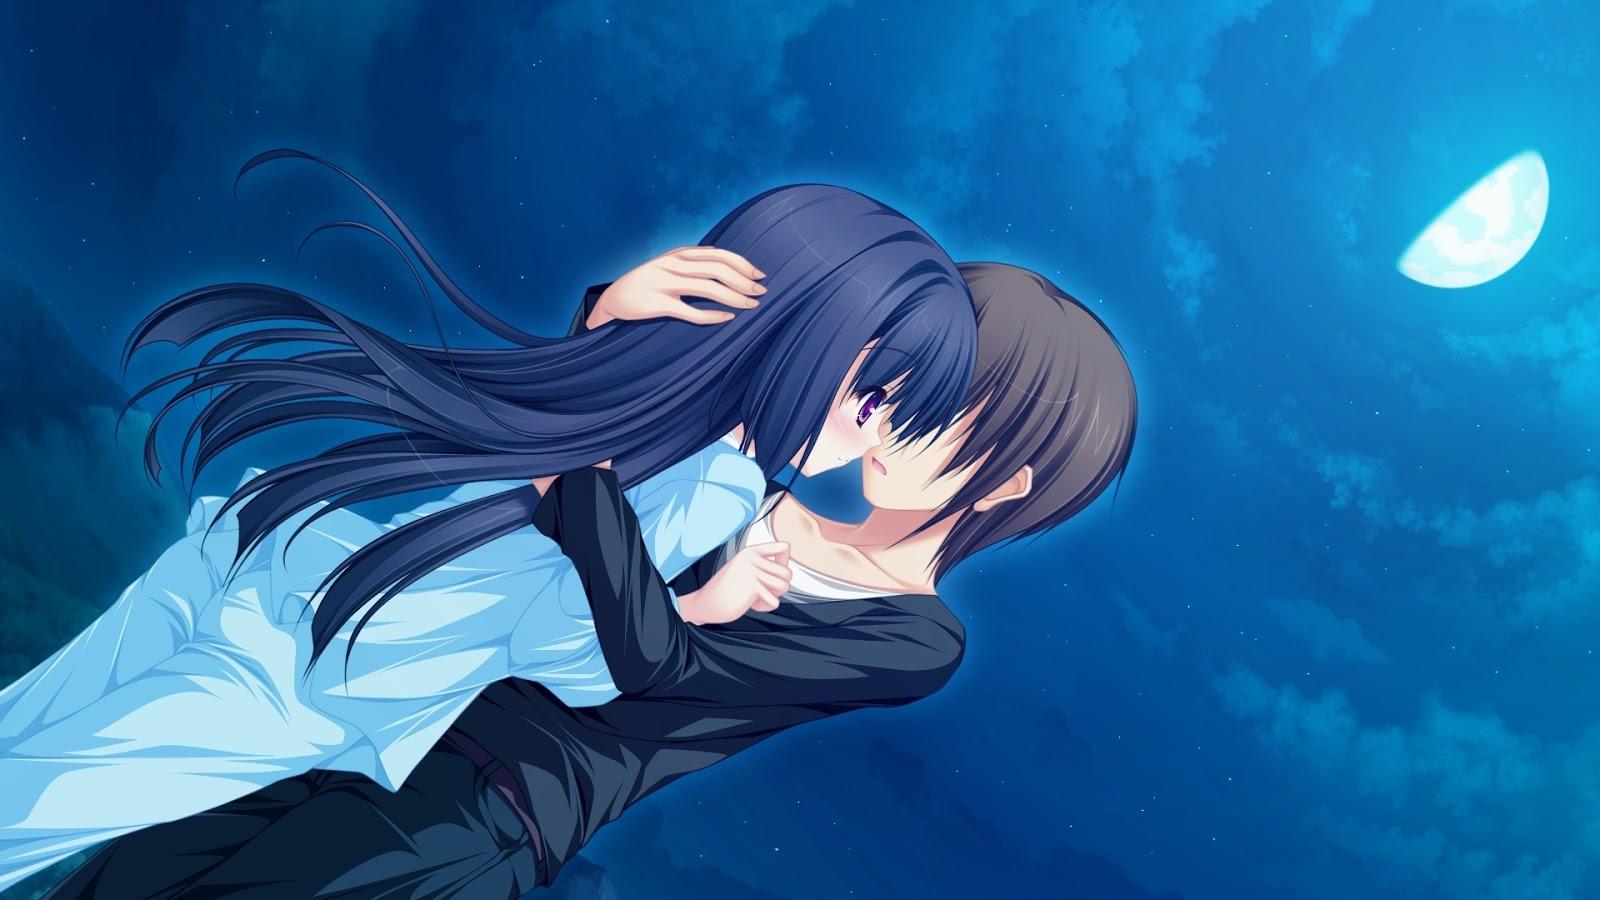 anime couple hugging wallpapers - photo #17